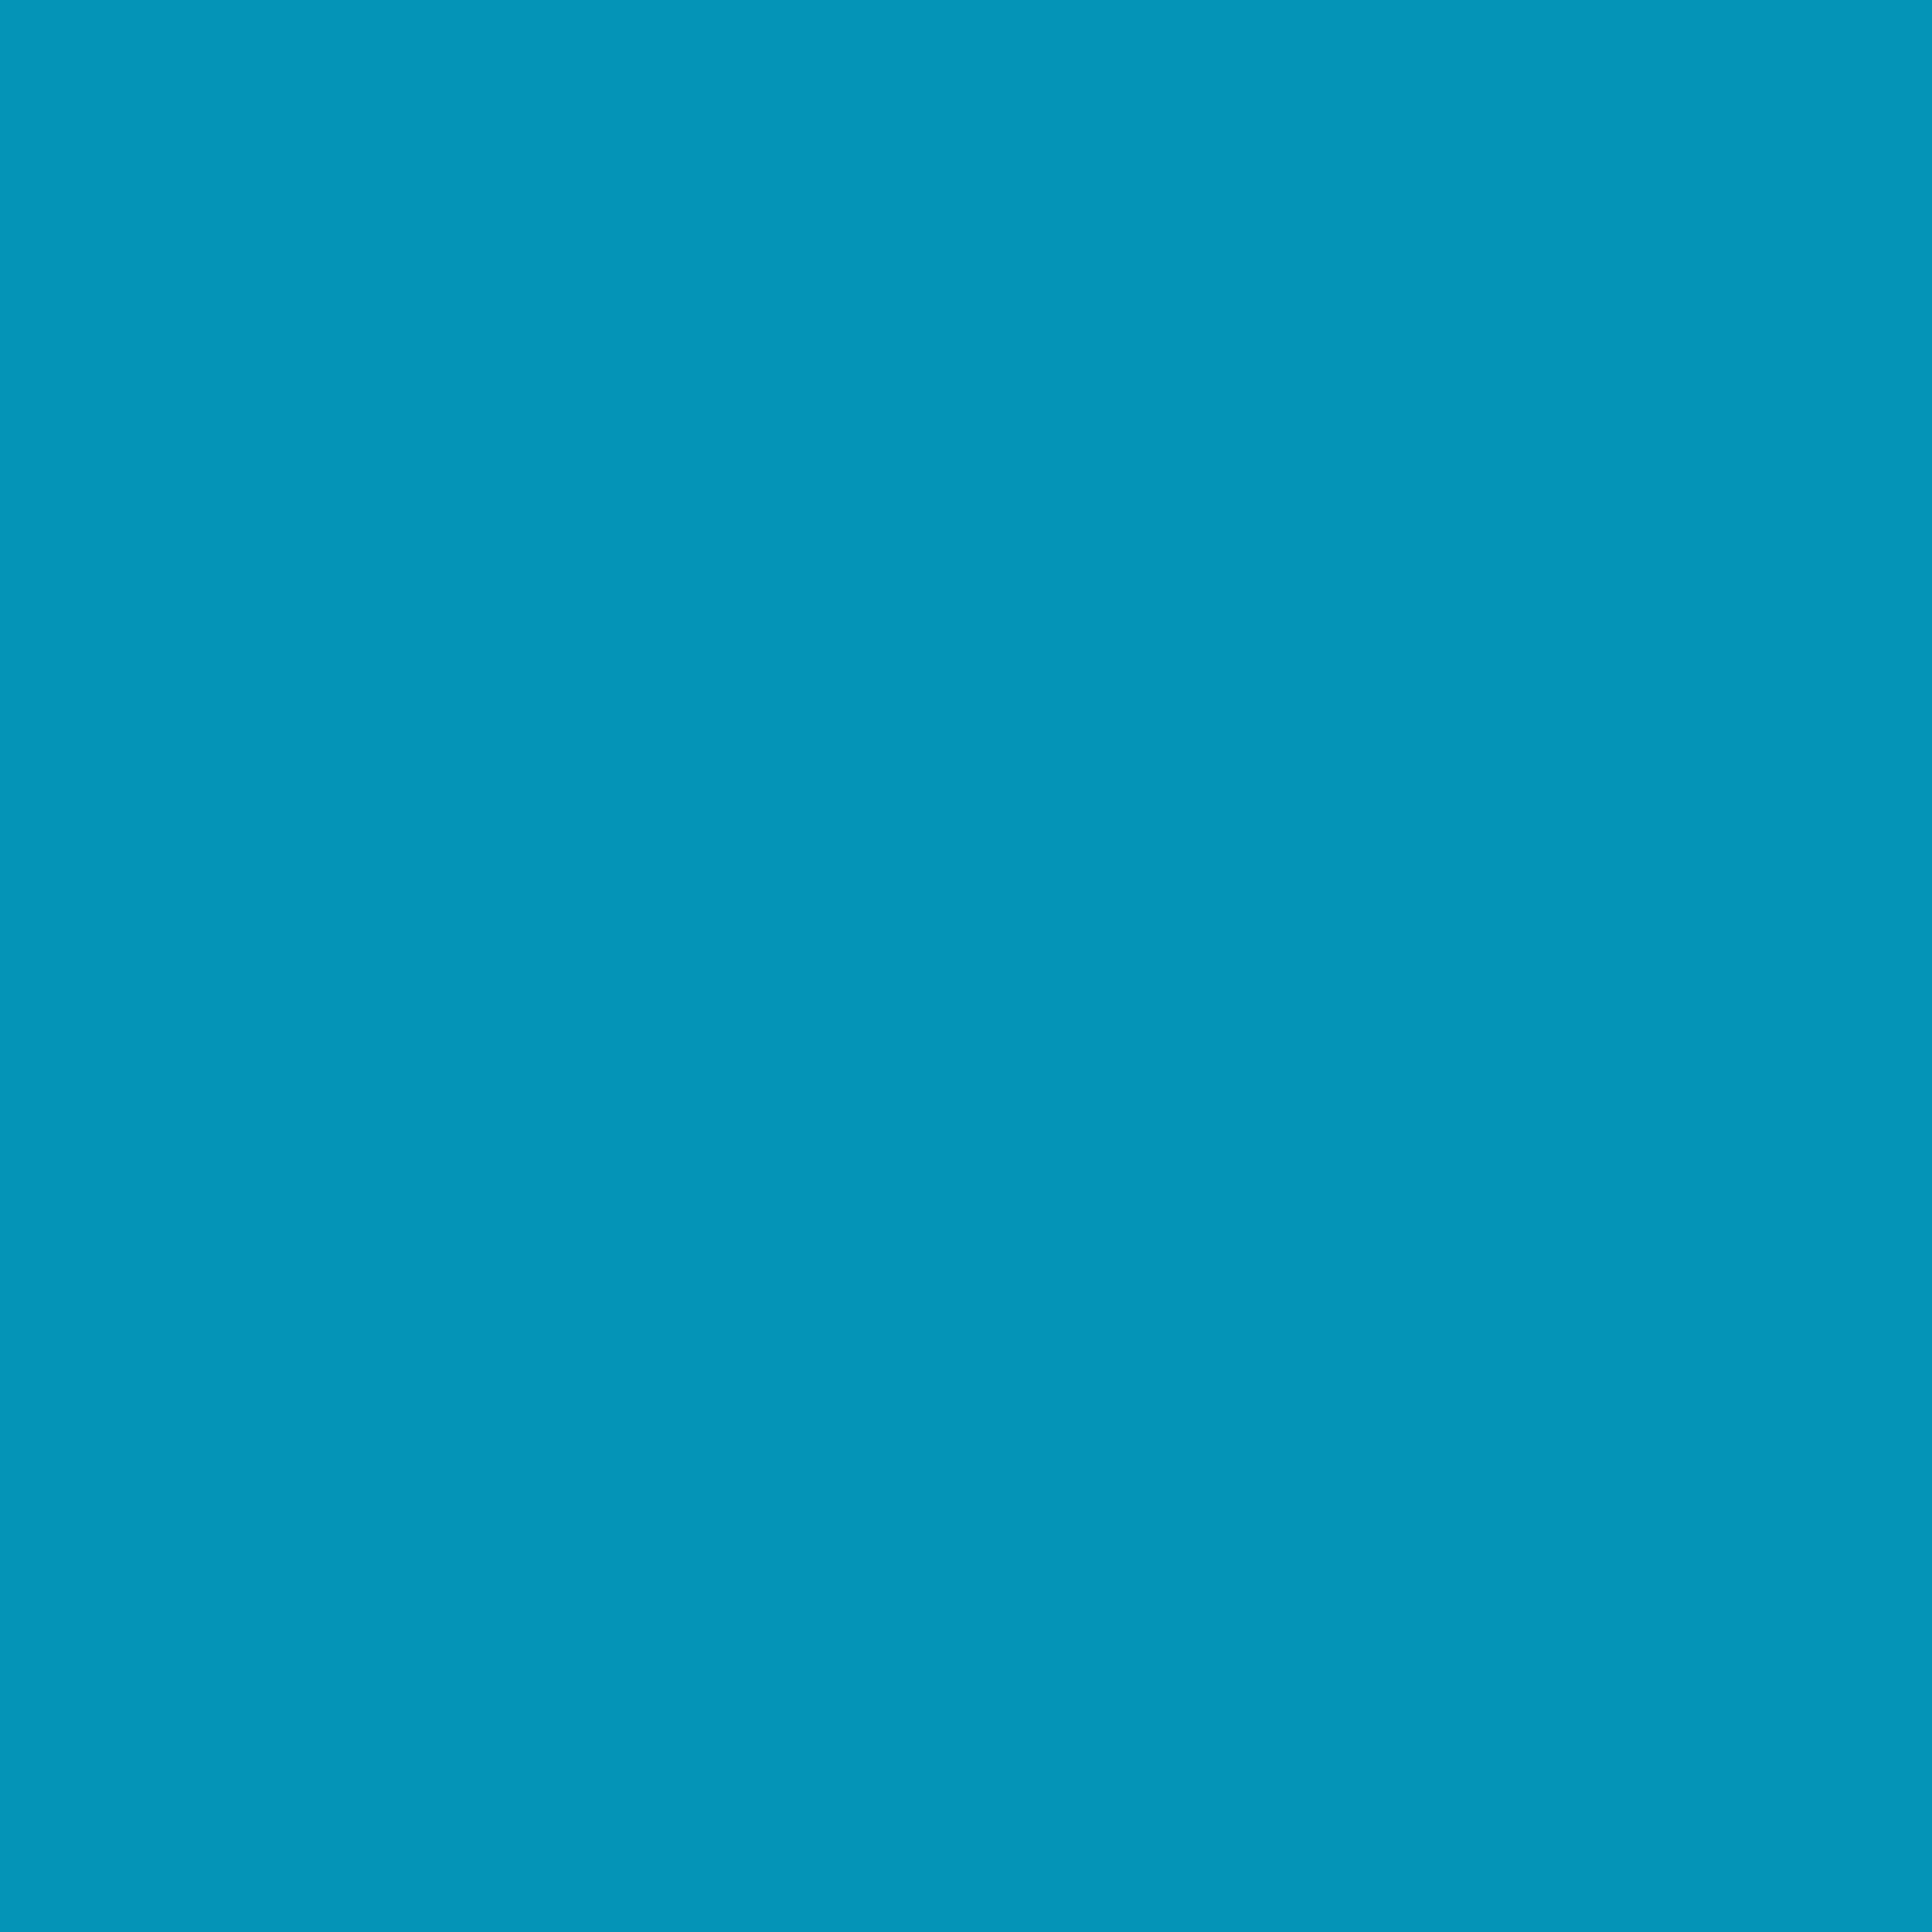 2732x2732 Bondi Blue Solid Color Background